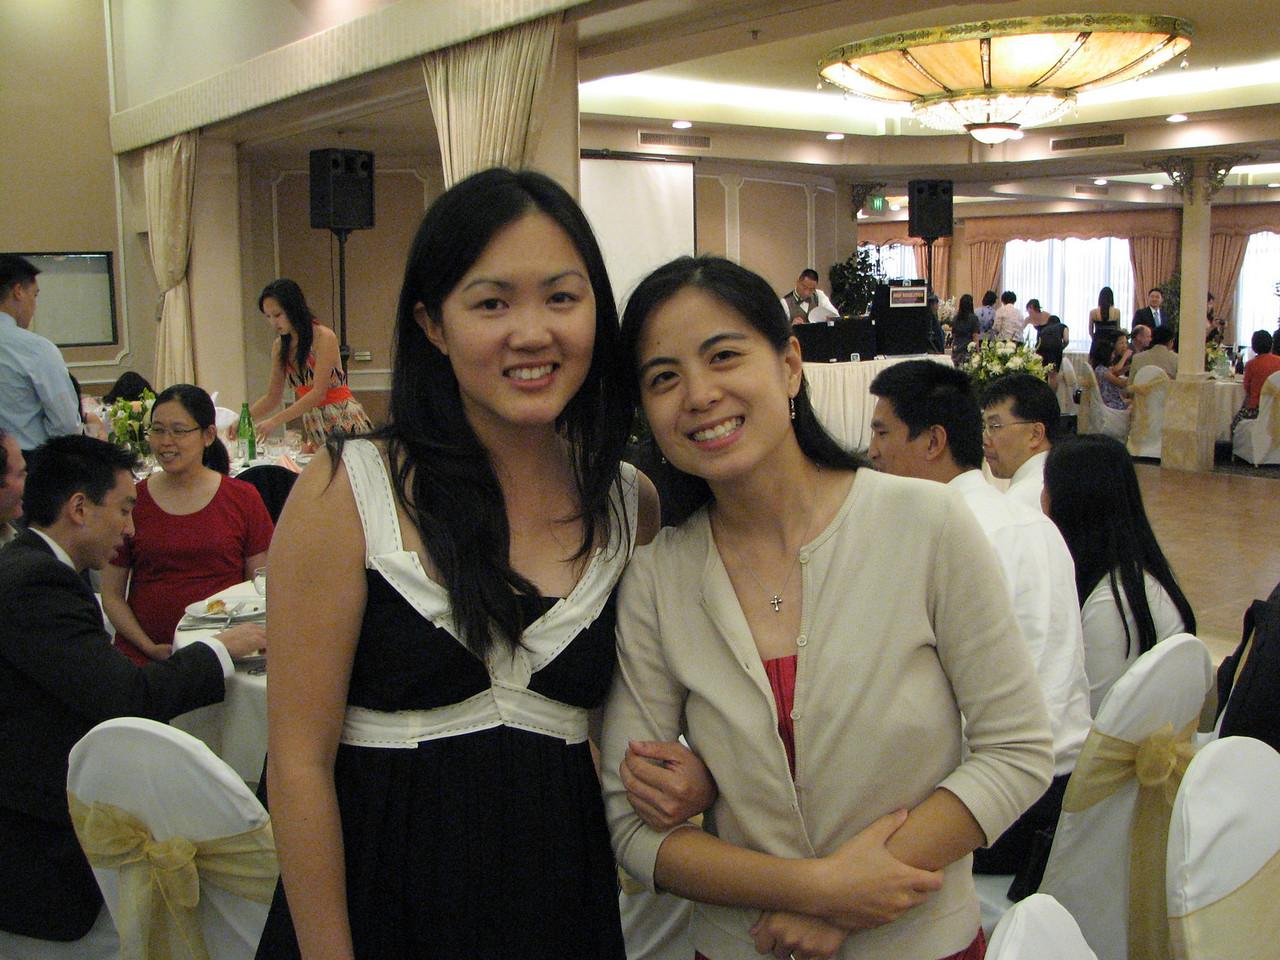 2007 06 09 Sat - Bernice Chen & Audrey Wu